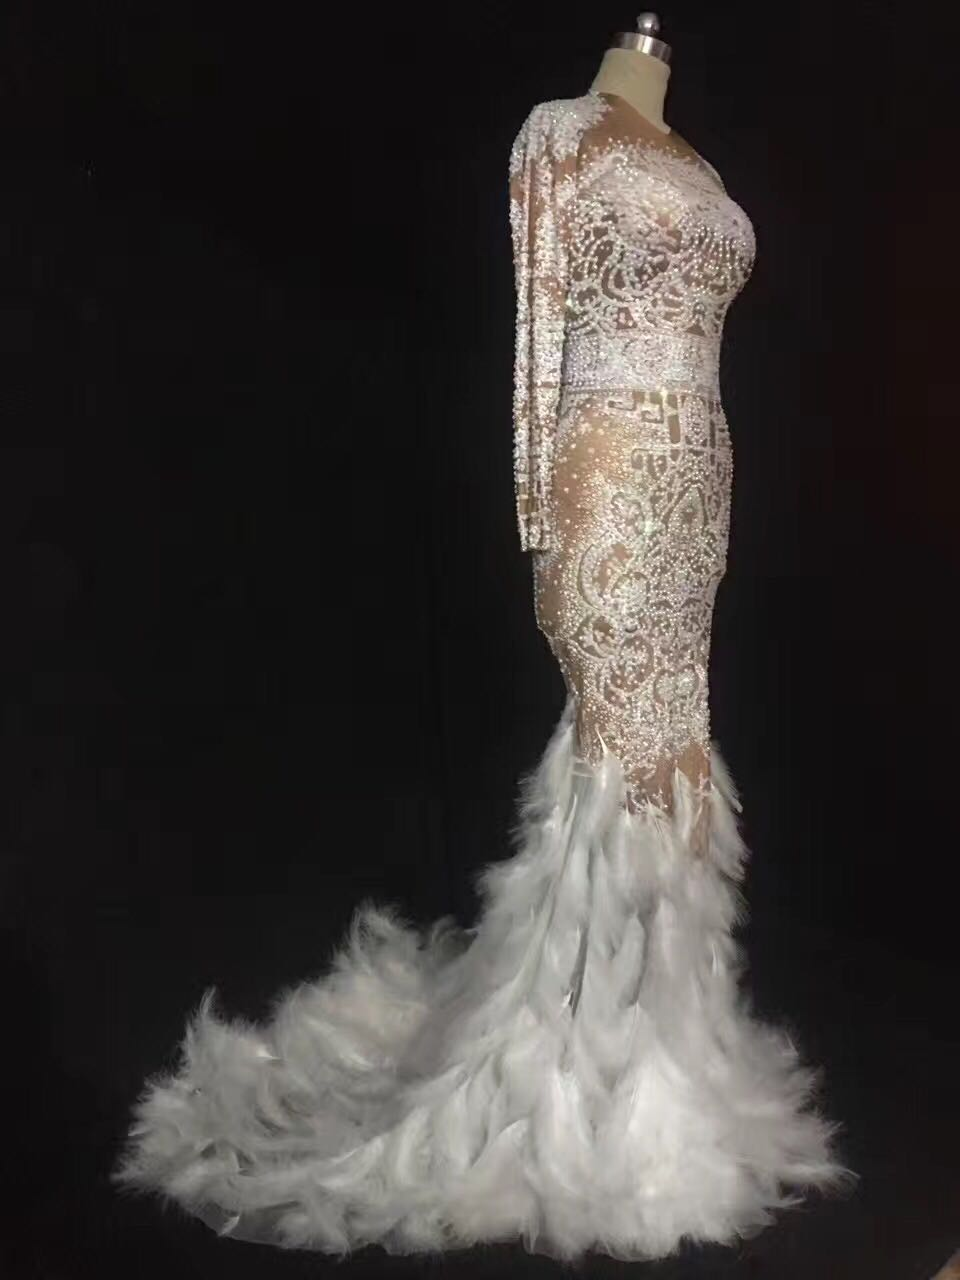 Evening Dance Rhinestones Feather Nude Dress Sexy Nightclub Full Stones Long Big Tail Costume Prom Birthday Celebrate Dresses